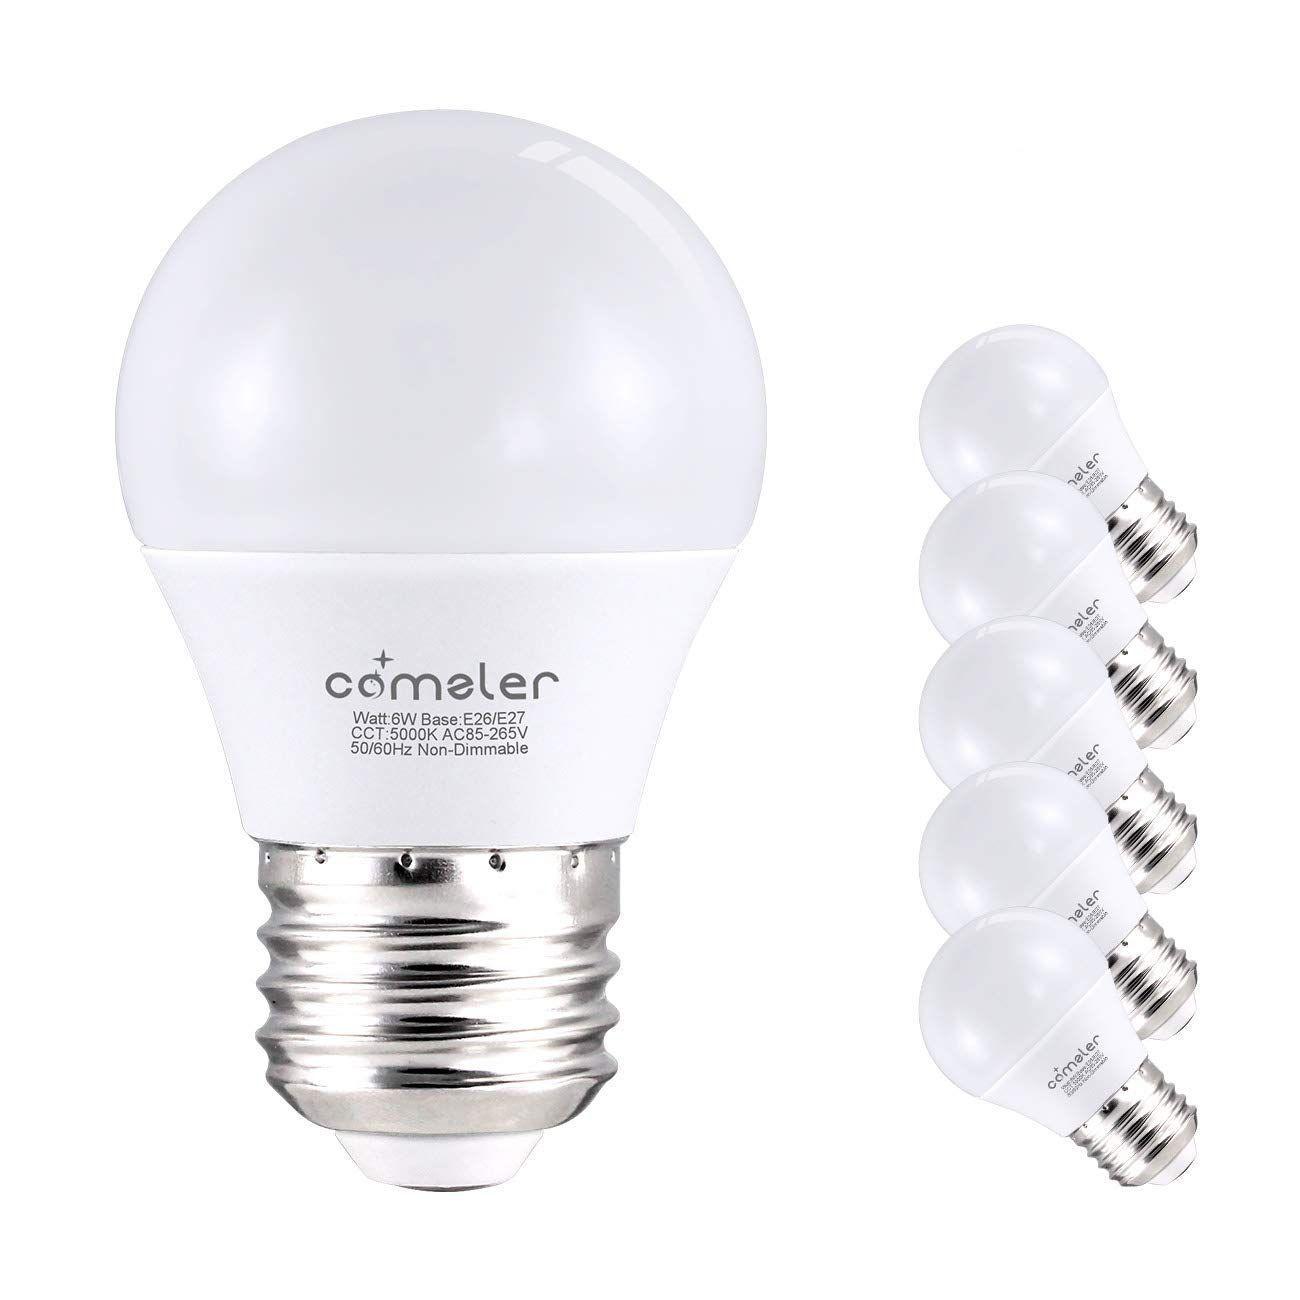 Comzler 6w A15 Led Bulb Daylight 60 Watt Equivalent E26 Medium Screw Base Small Light Bulb Cool White 5 In 2020 Decorative Ceiling Fans Ceiling Fan With Light Led Bulb